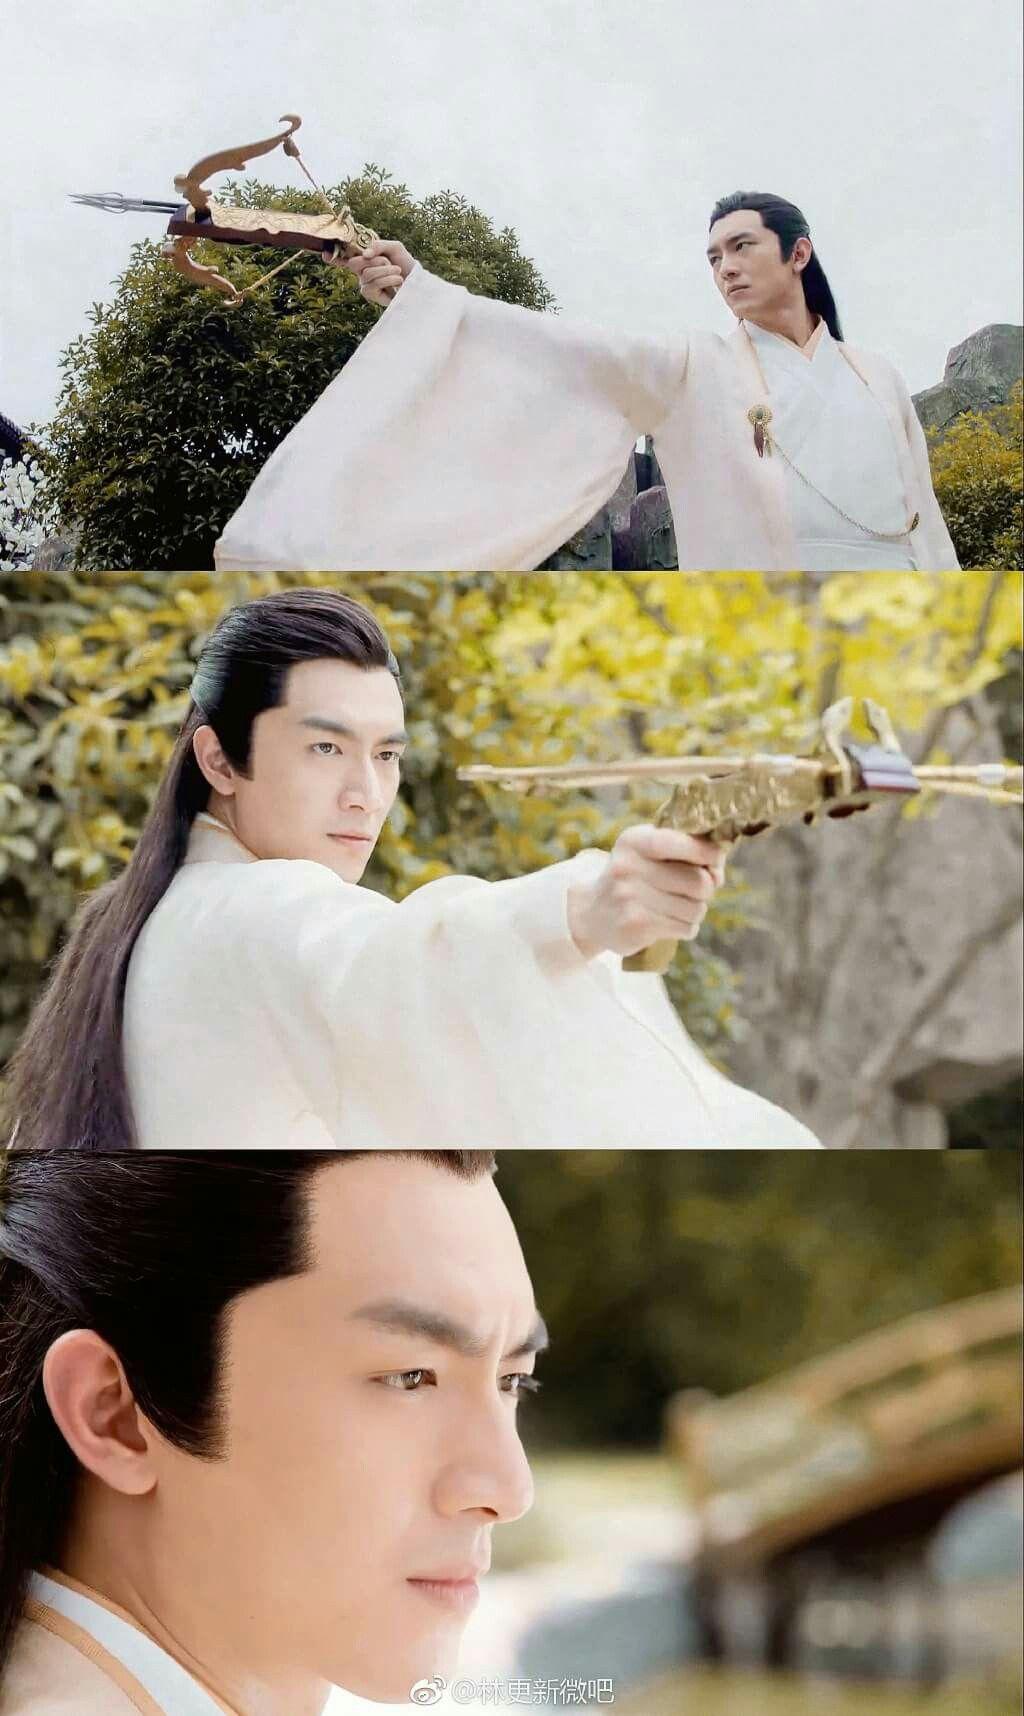 Main Role Yuwen Yue In Tv Drama Princess Agents English Subtitle For Season 1 Https Www Youtube Com Playlist L Princess Agents Asian Film Drama Taiwan